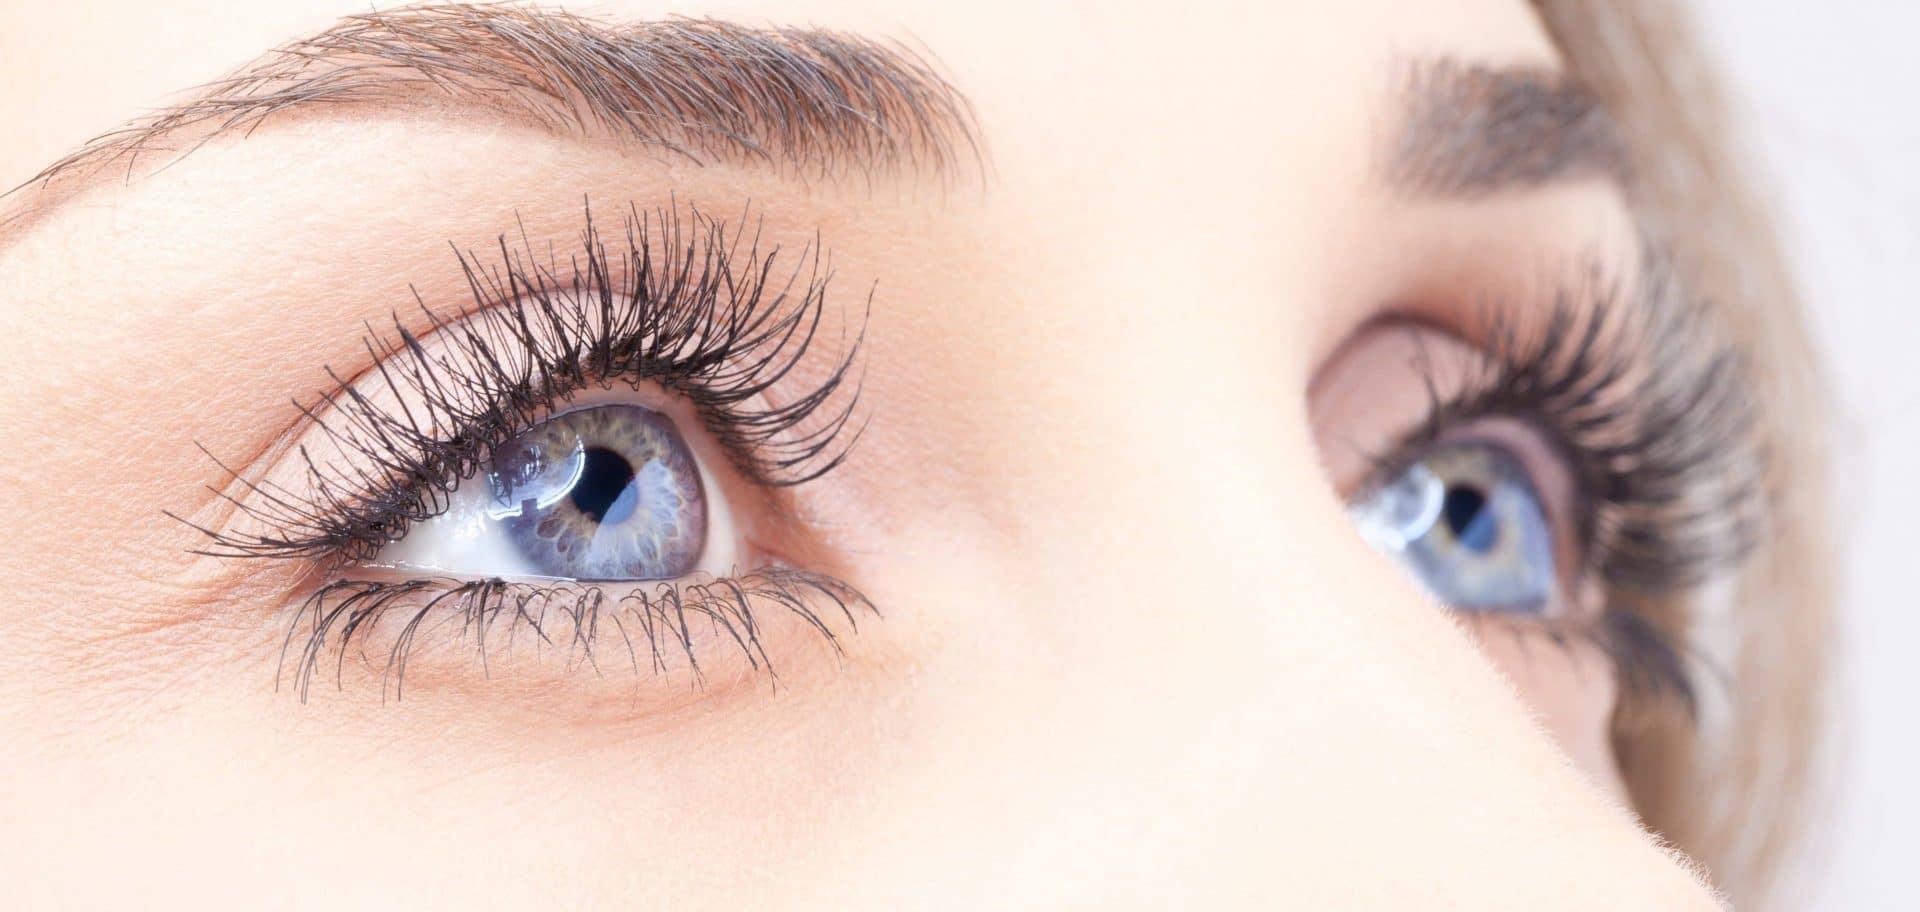 Eye Exercise for Improve Vision and Eyesight